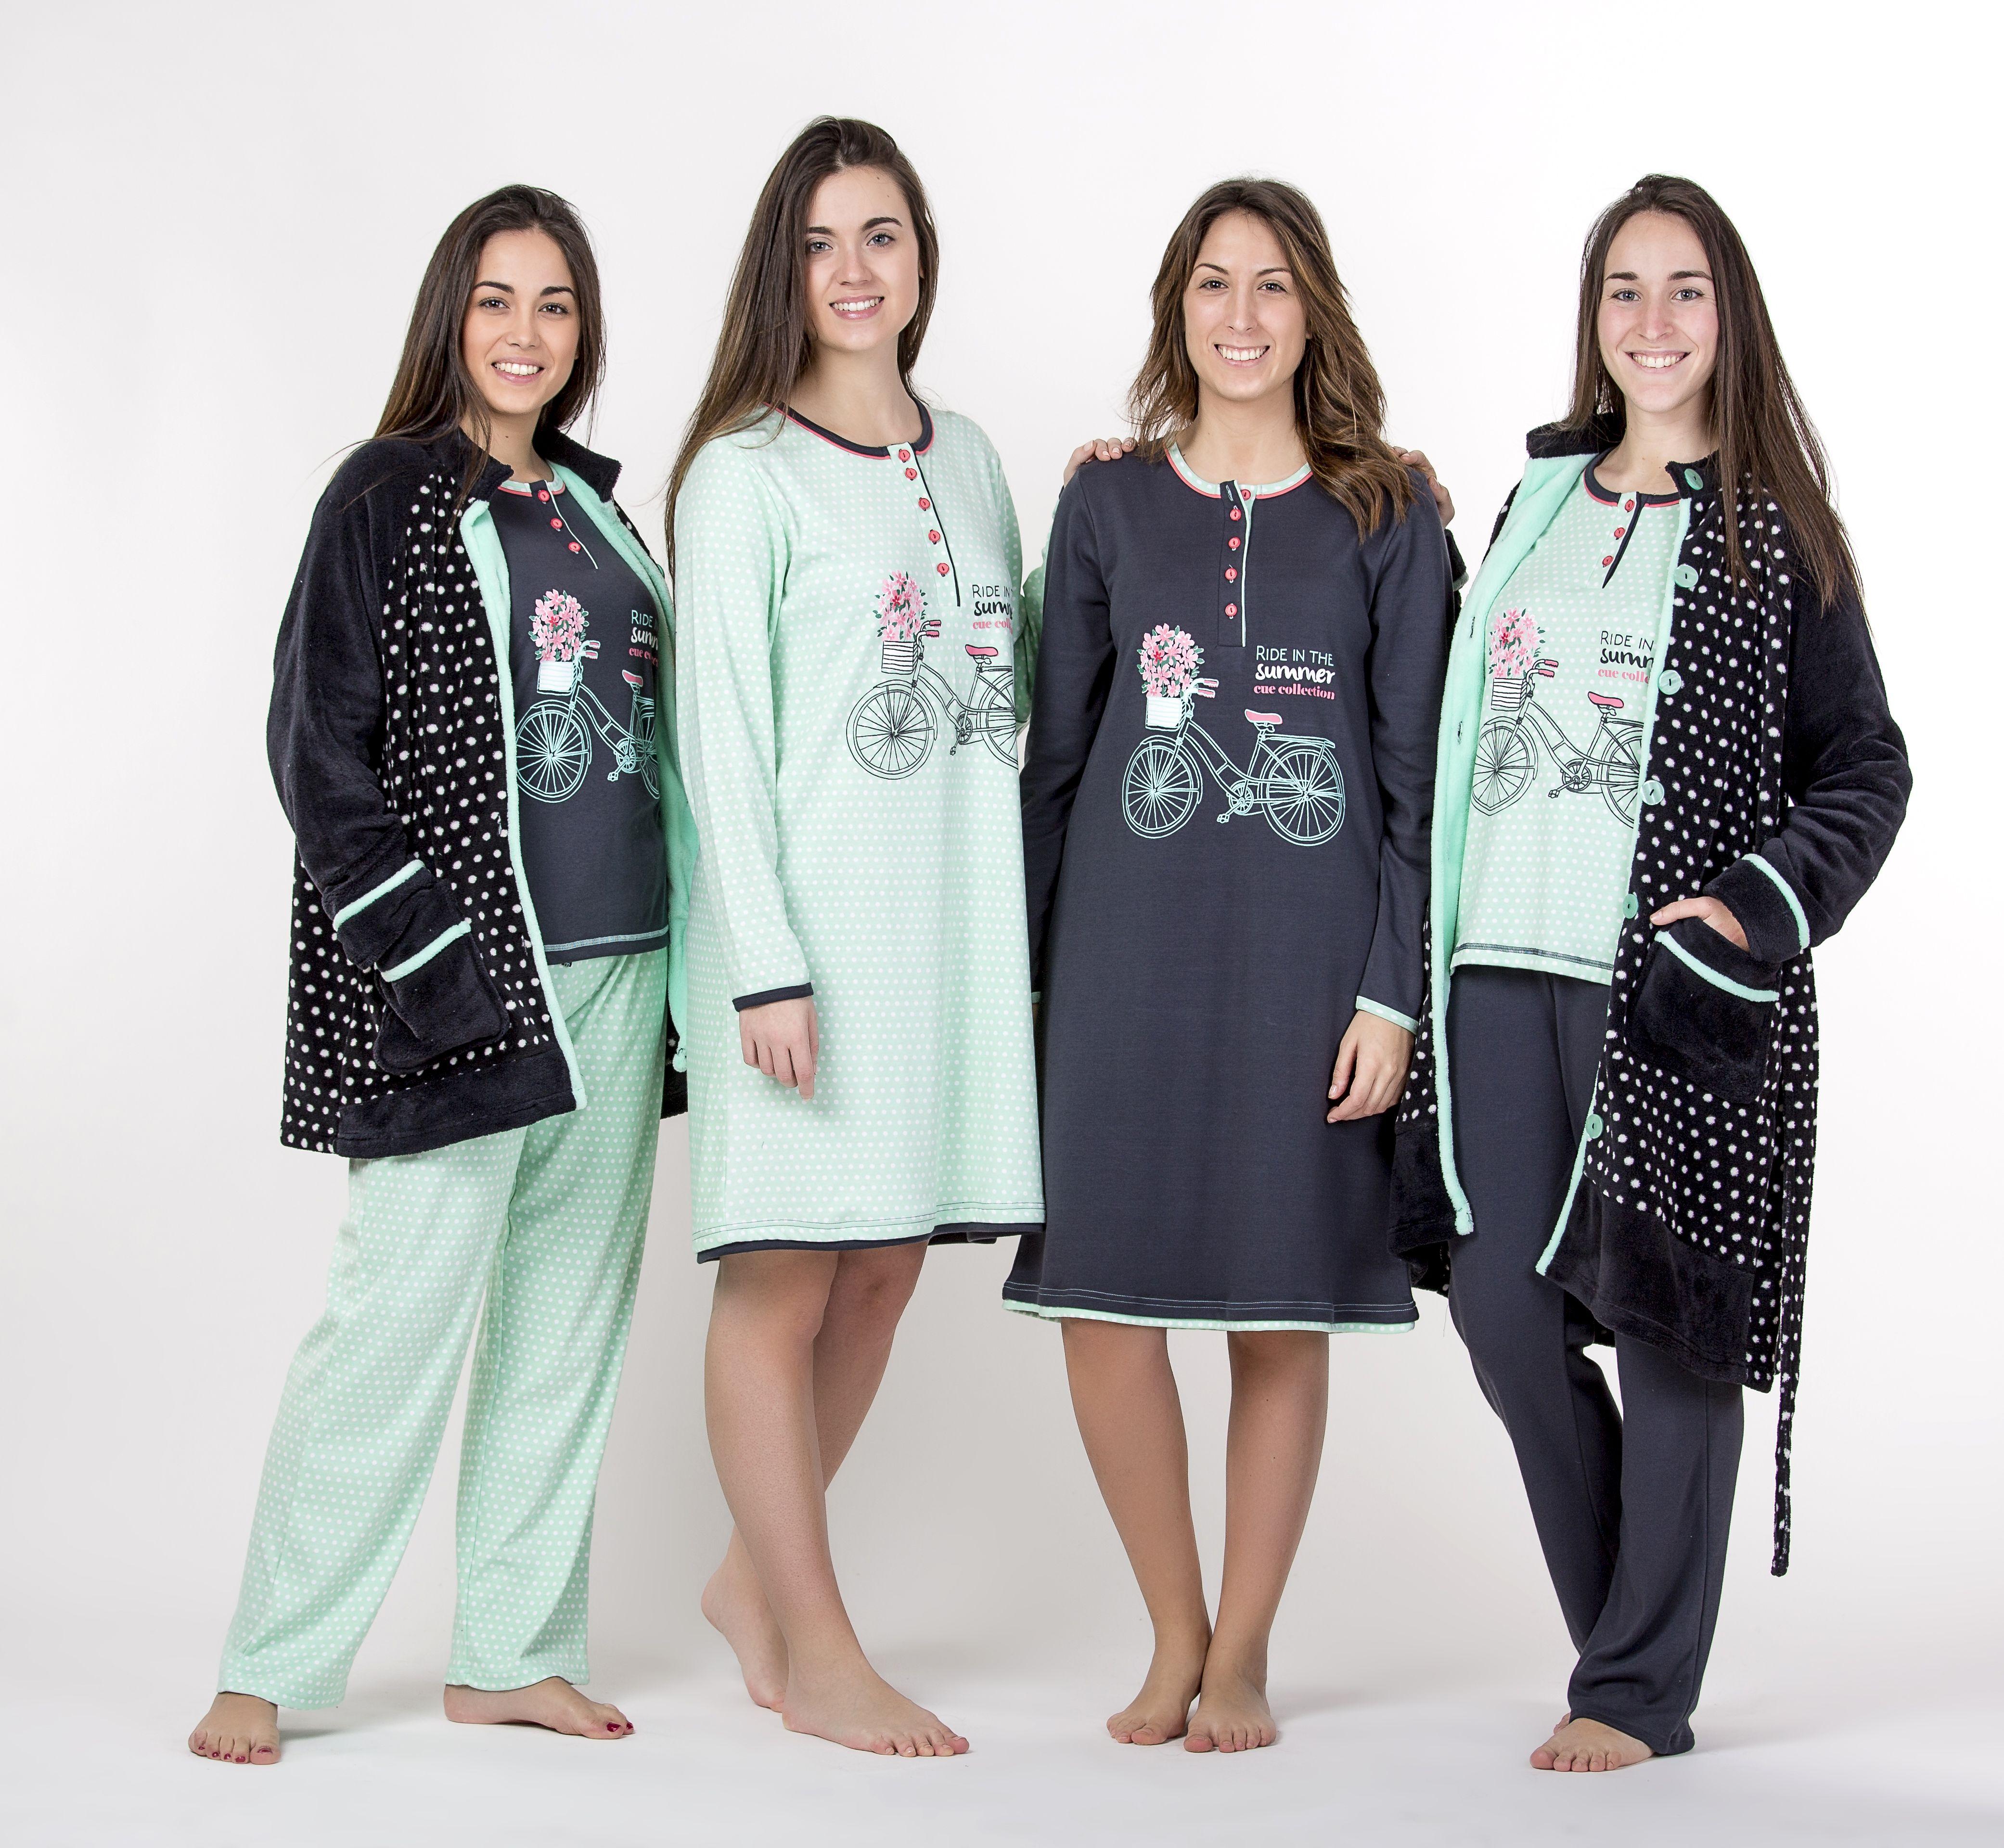 Pijama Bata Mujer Chica Senora Estampado Gris Verde Pantalon Camiseta Largo Bicicleta Flores Topos Diseno Batas De Mujer Ropa Moda Para Mujer